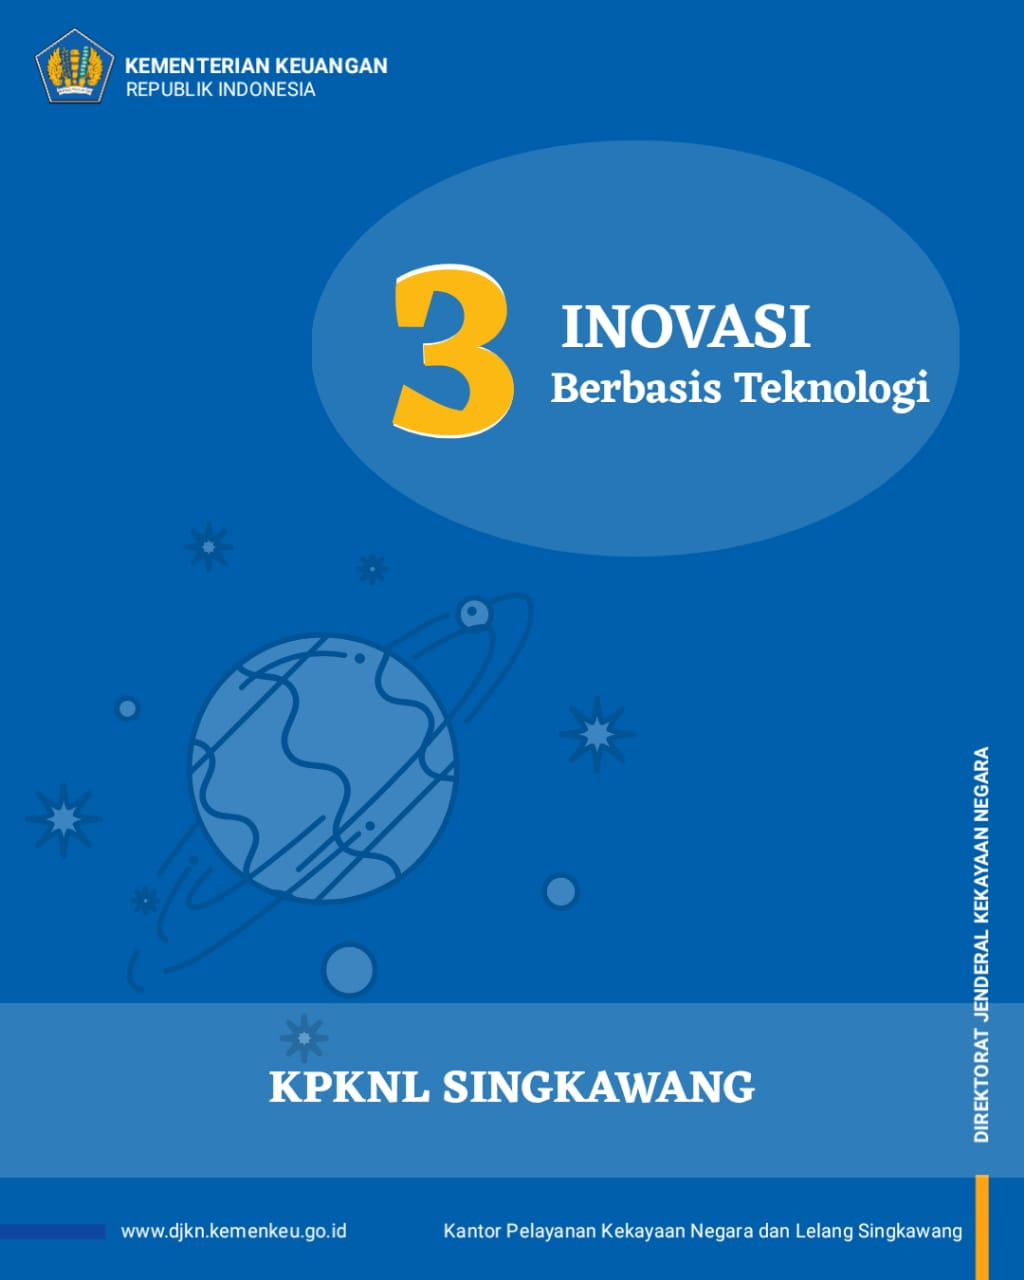 Pengembangan Inovasi Pada KPKNL Singkawang